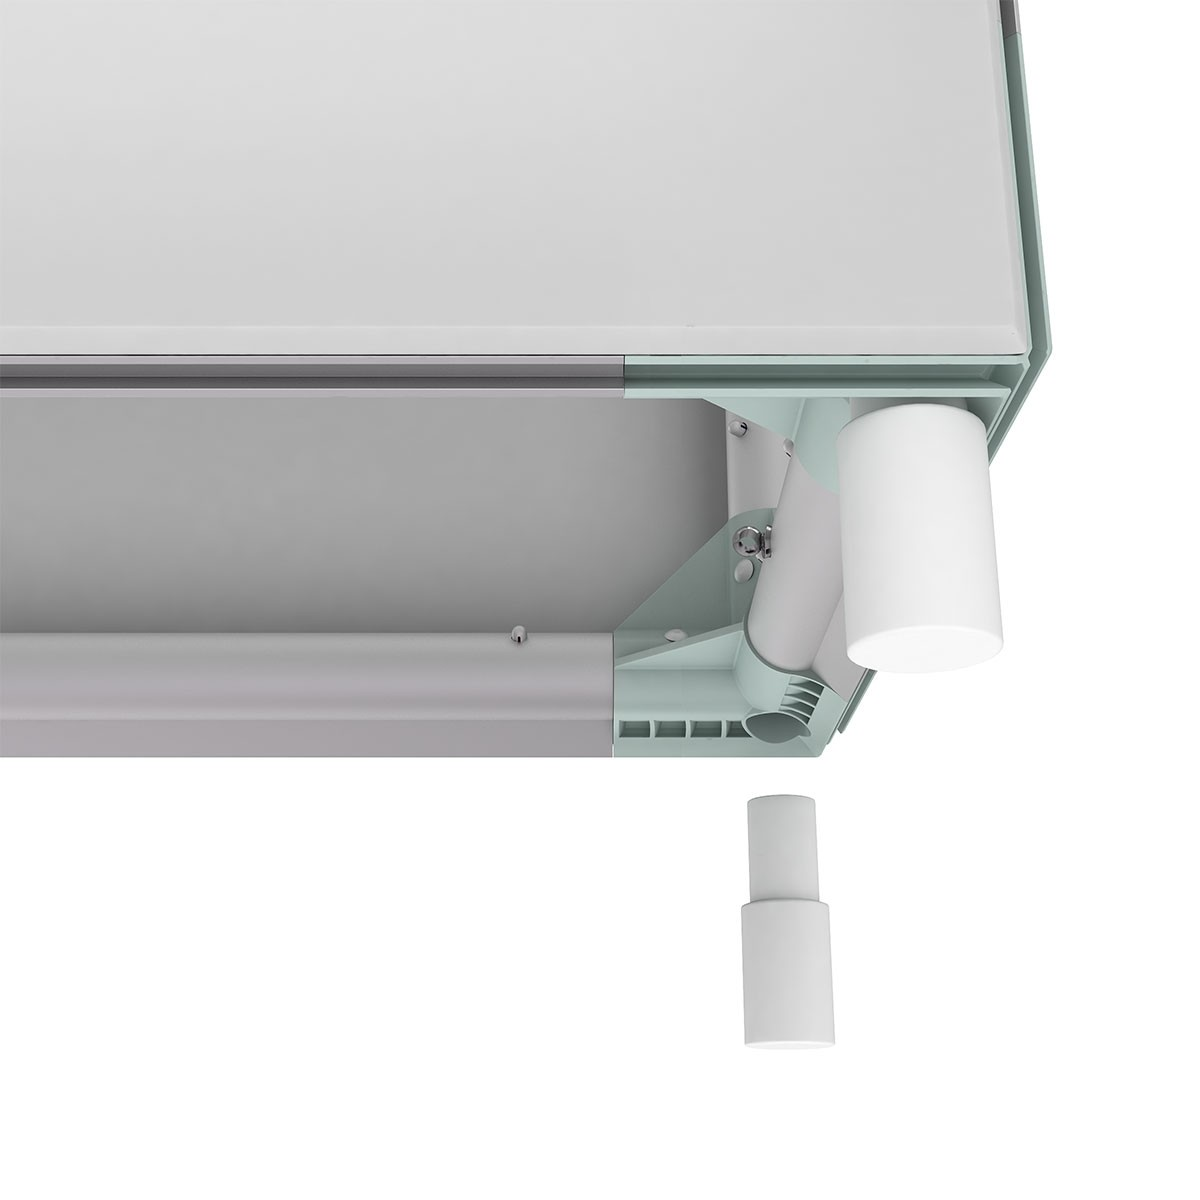 Casonara 200M Backlit Counter